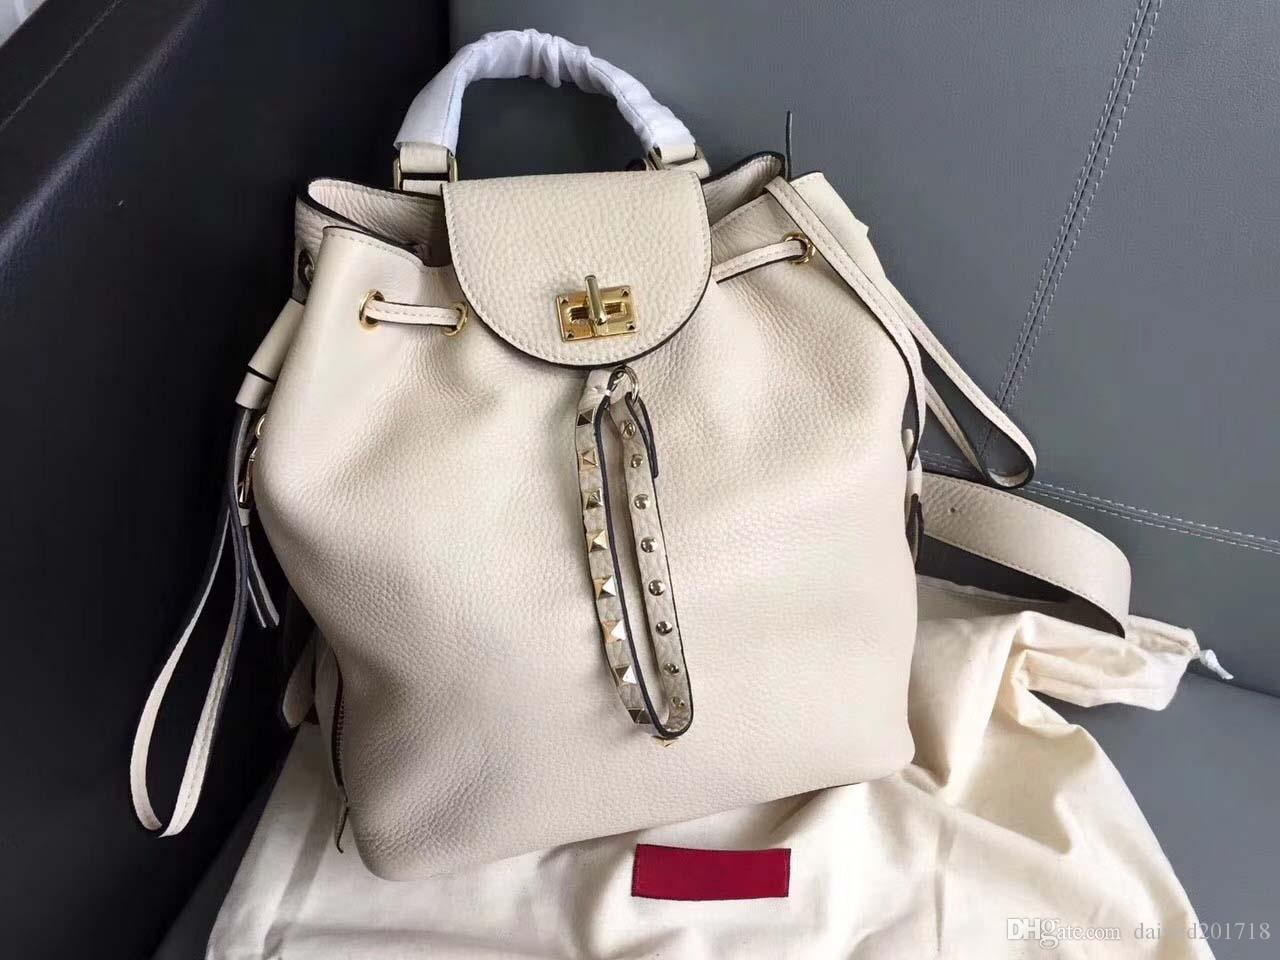 Europ luxury style orignal real Genuine leather fashion back pack shoulder bag handbag presbyopic mini package messenger bag mobile phonen